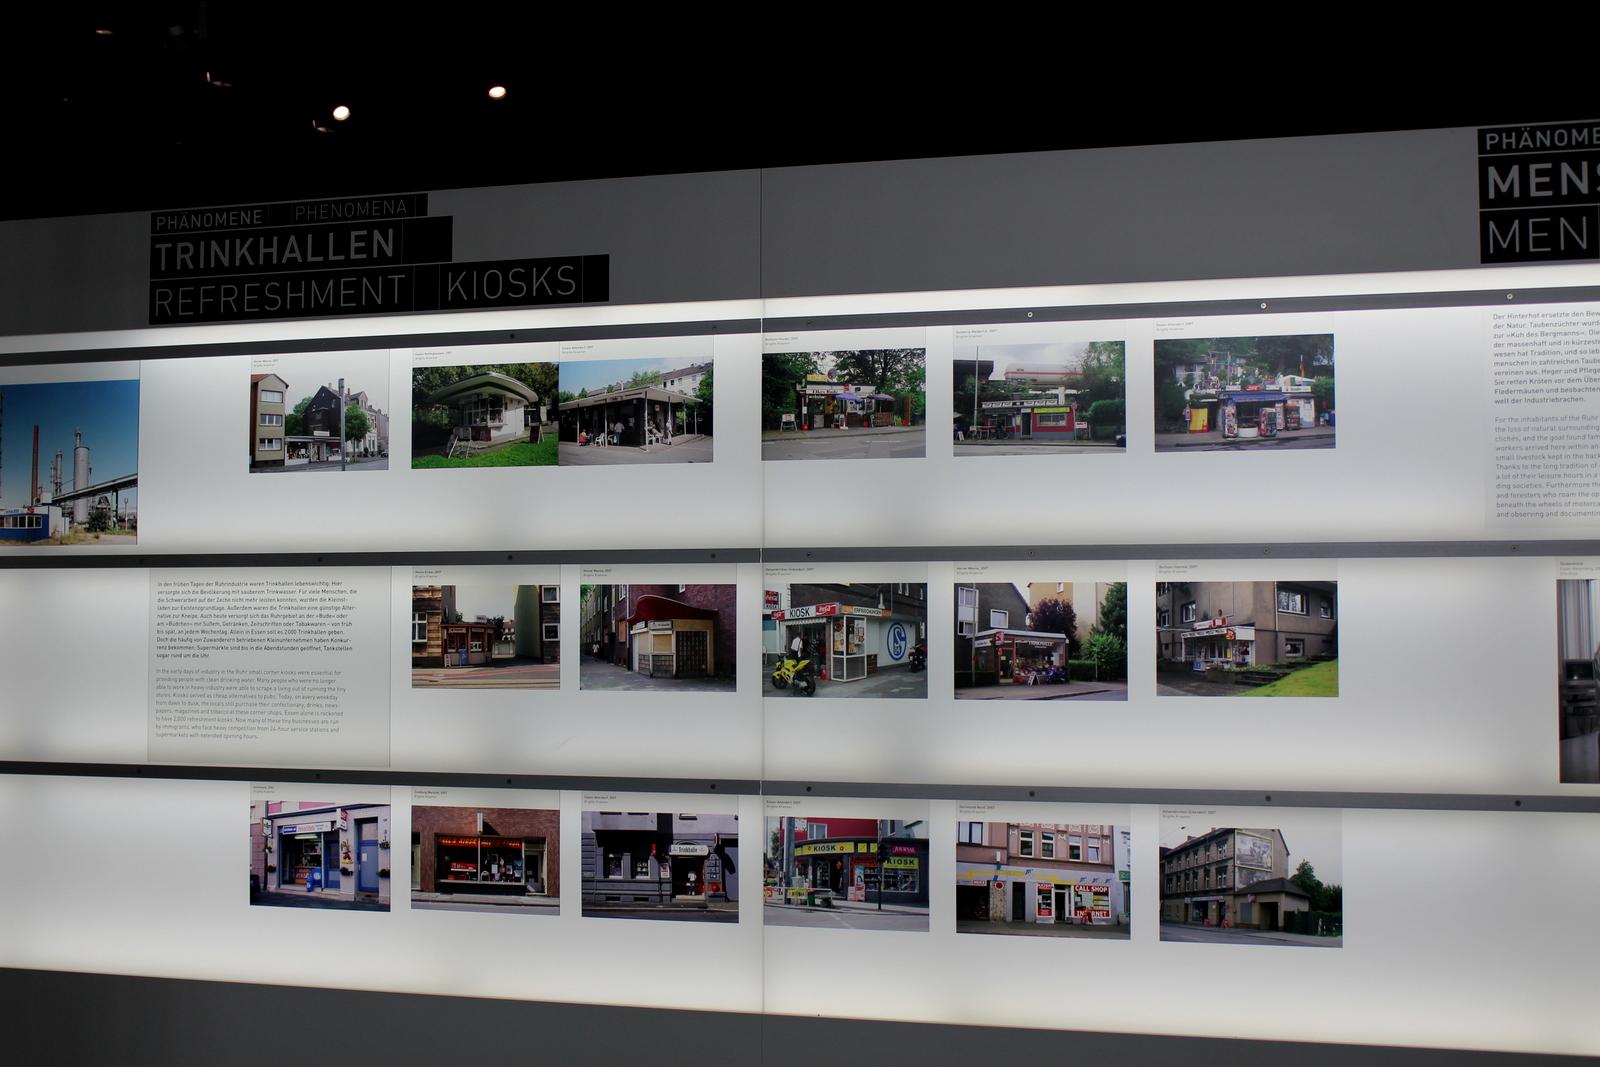 Meine Top 3 Erlebnis-Museen im Ruhrgebiet